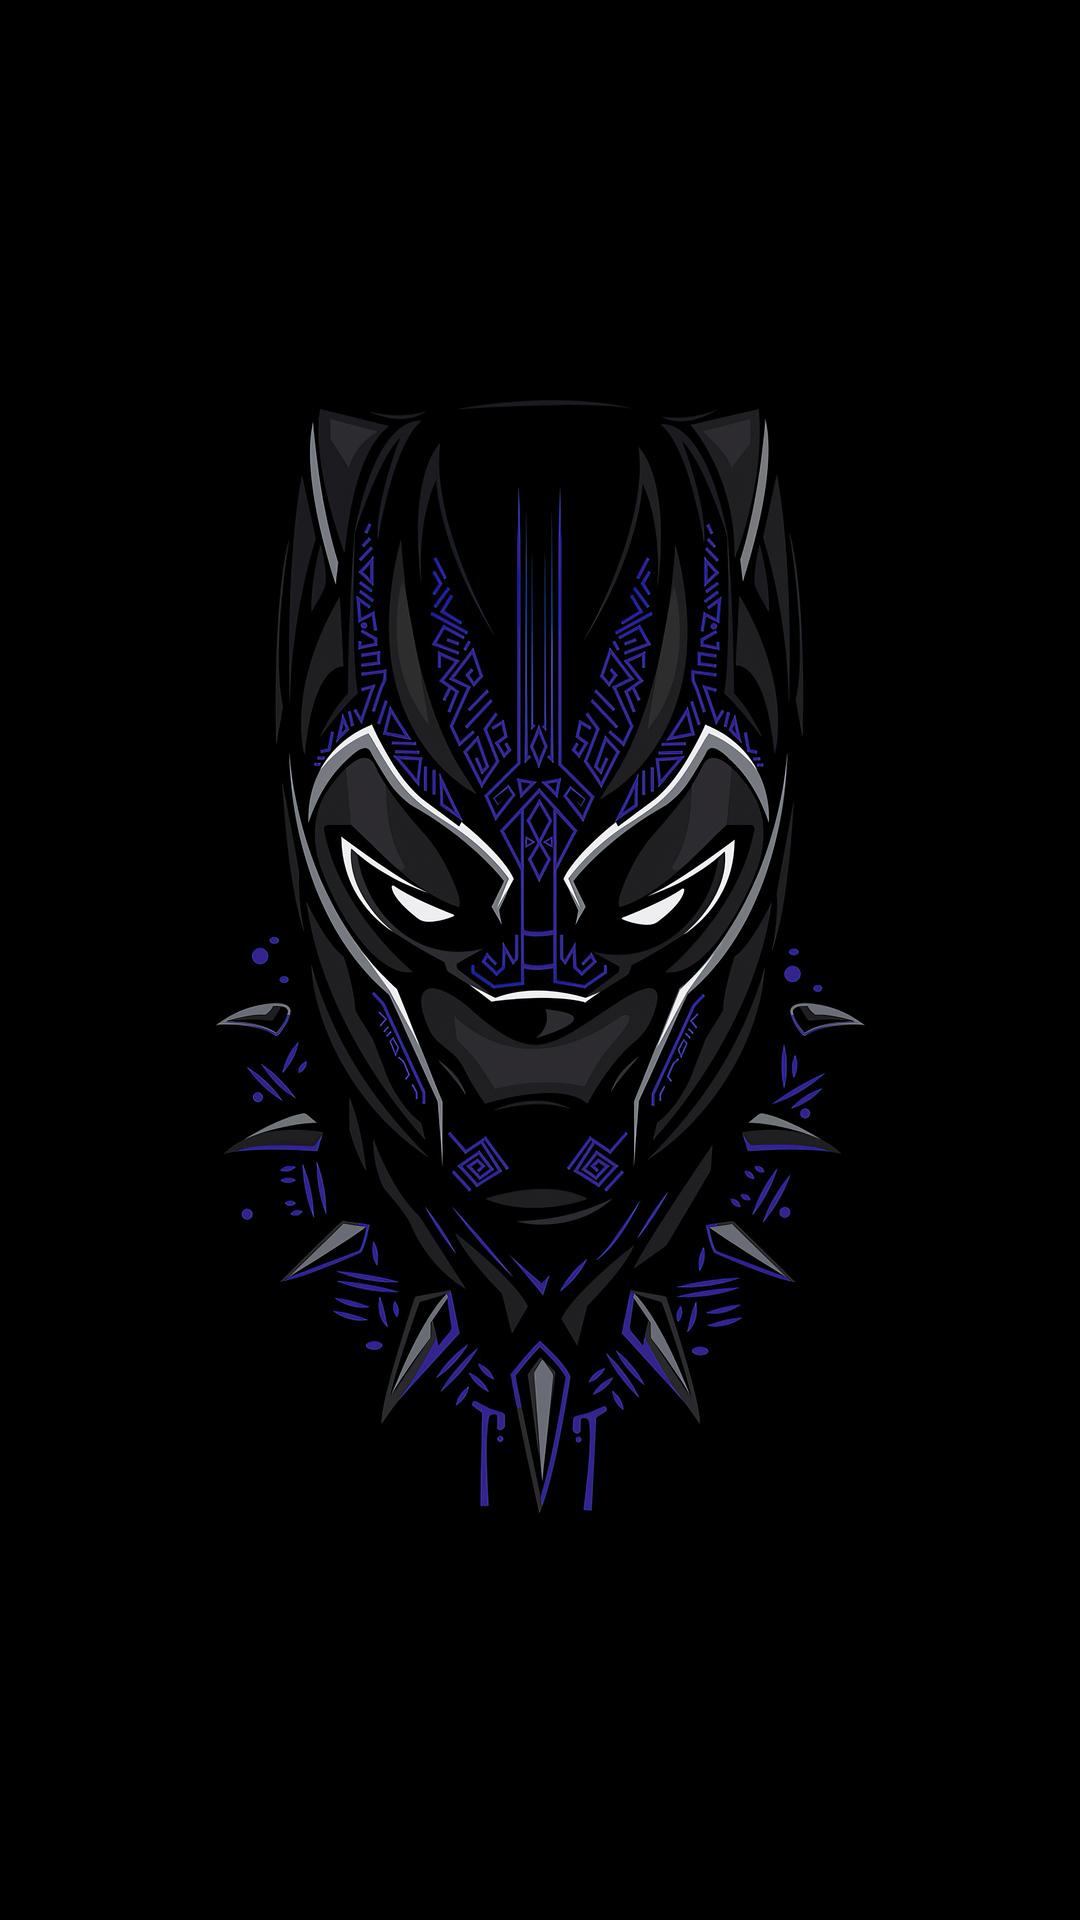 1080x1920 Black Panther 4k Minimalism 2020 Iphone 7,6s,6 ...